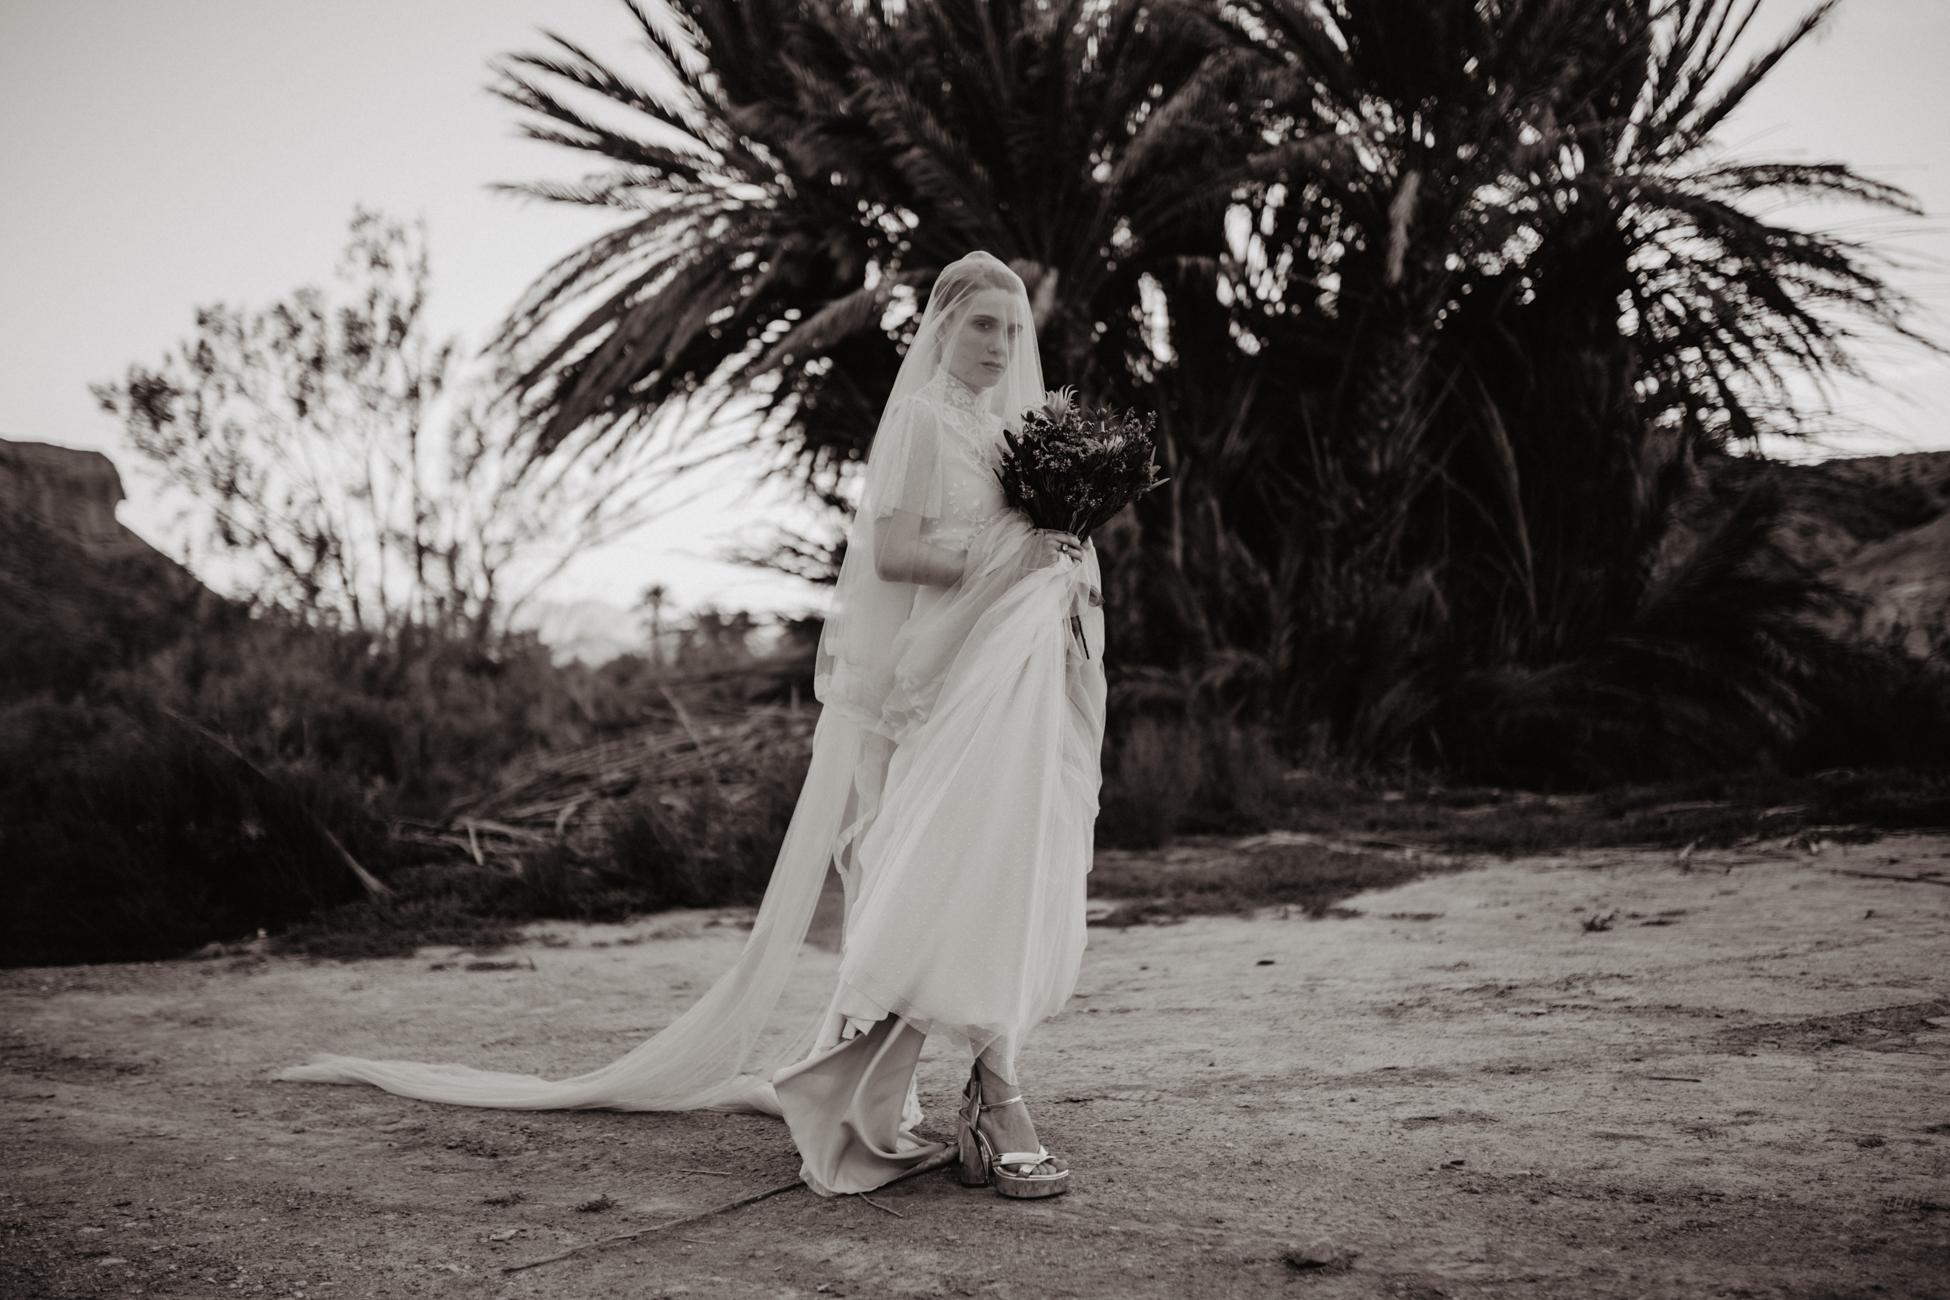 thenortherngirlphotography_photography_thenortherngirl_rebeccascabros_wedding_weddingphotography_weddingphotographer_wood_muebles_deco_bodasdecaramelo_home_bedtime_gaywedding_editorial_desierto_desert_wildestdreams_amortexano-356.jpg